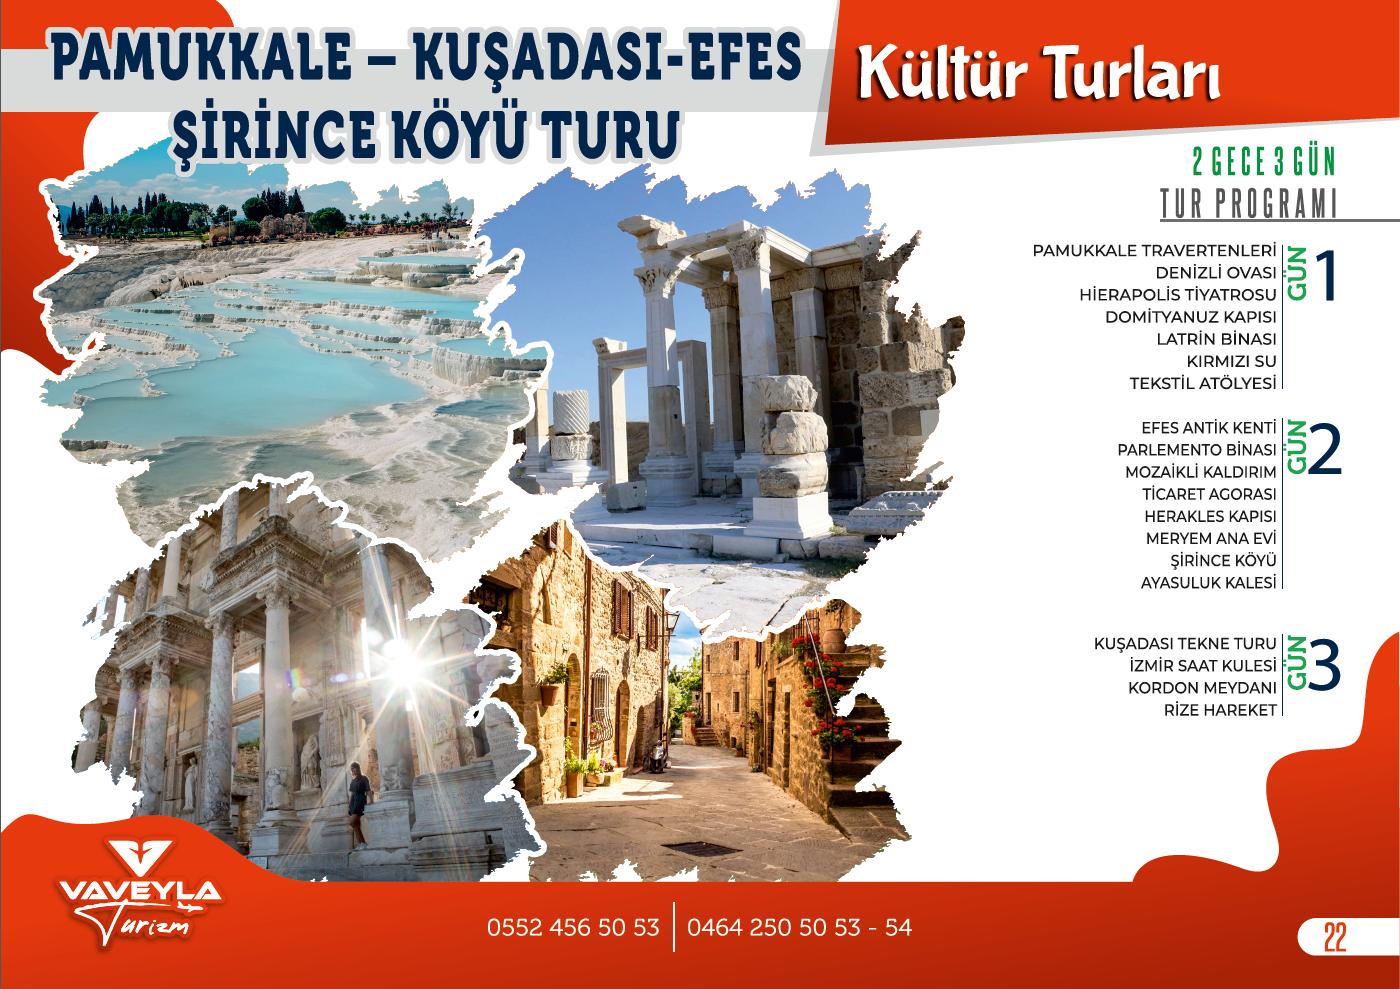 Pamukkale - Kuşadası - Efes - Şirince Köyü Turu